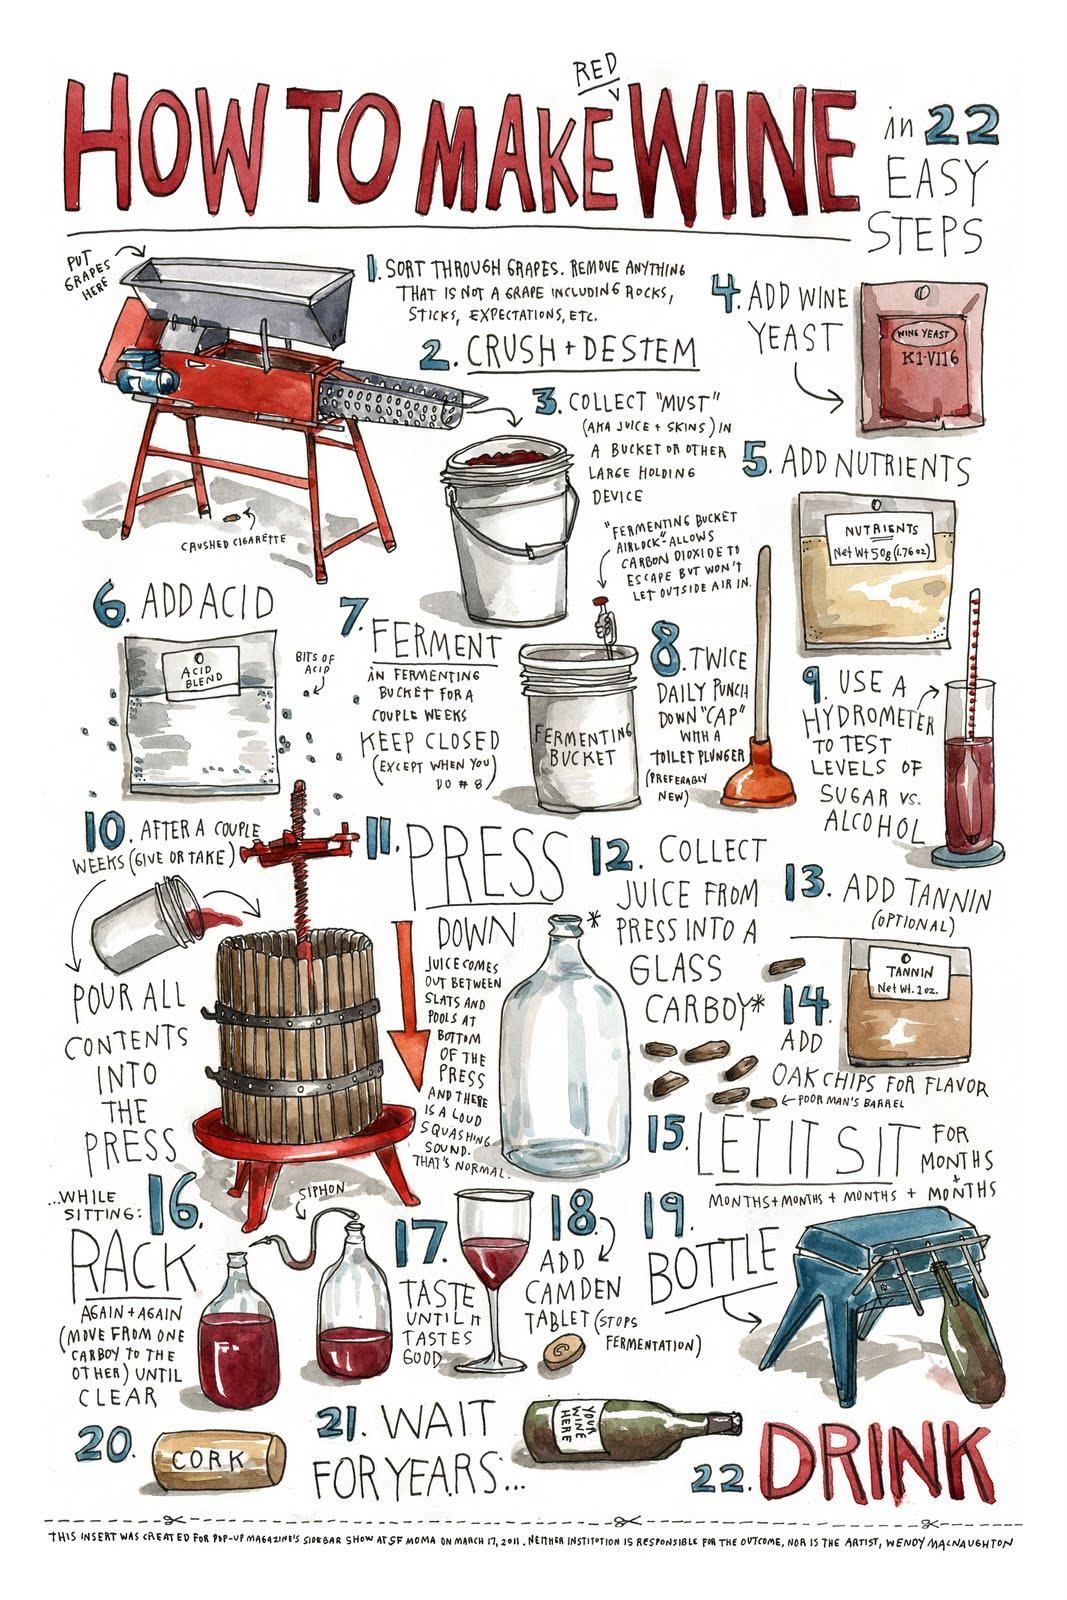 hvordan laver man rosevin